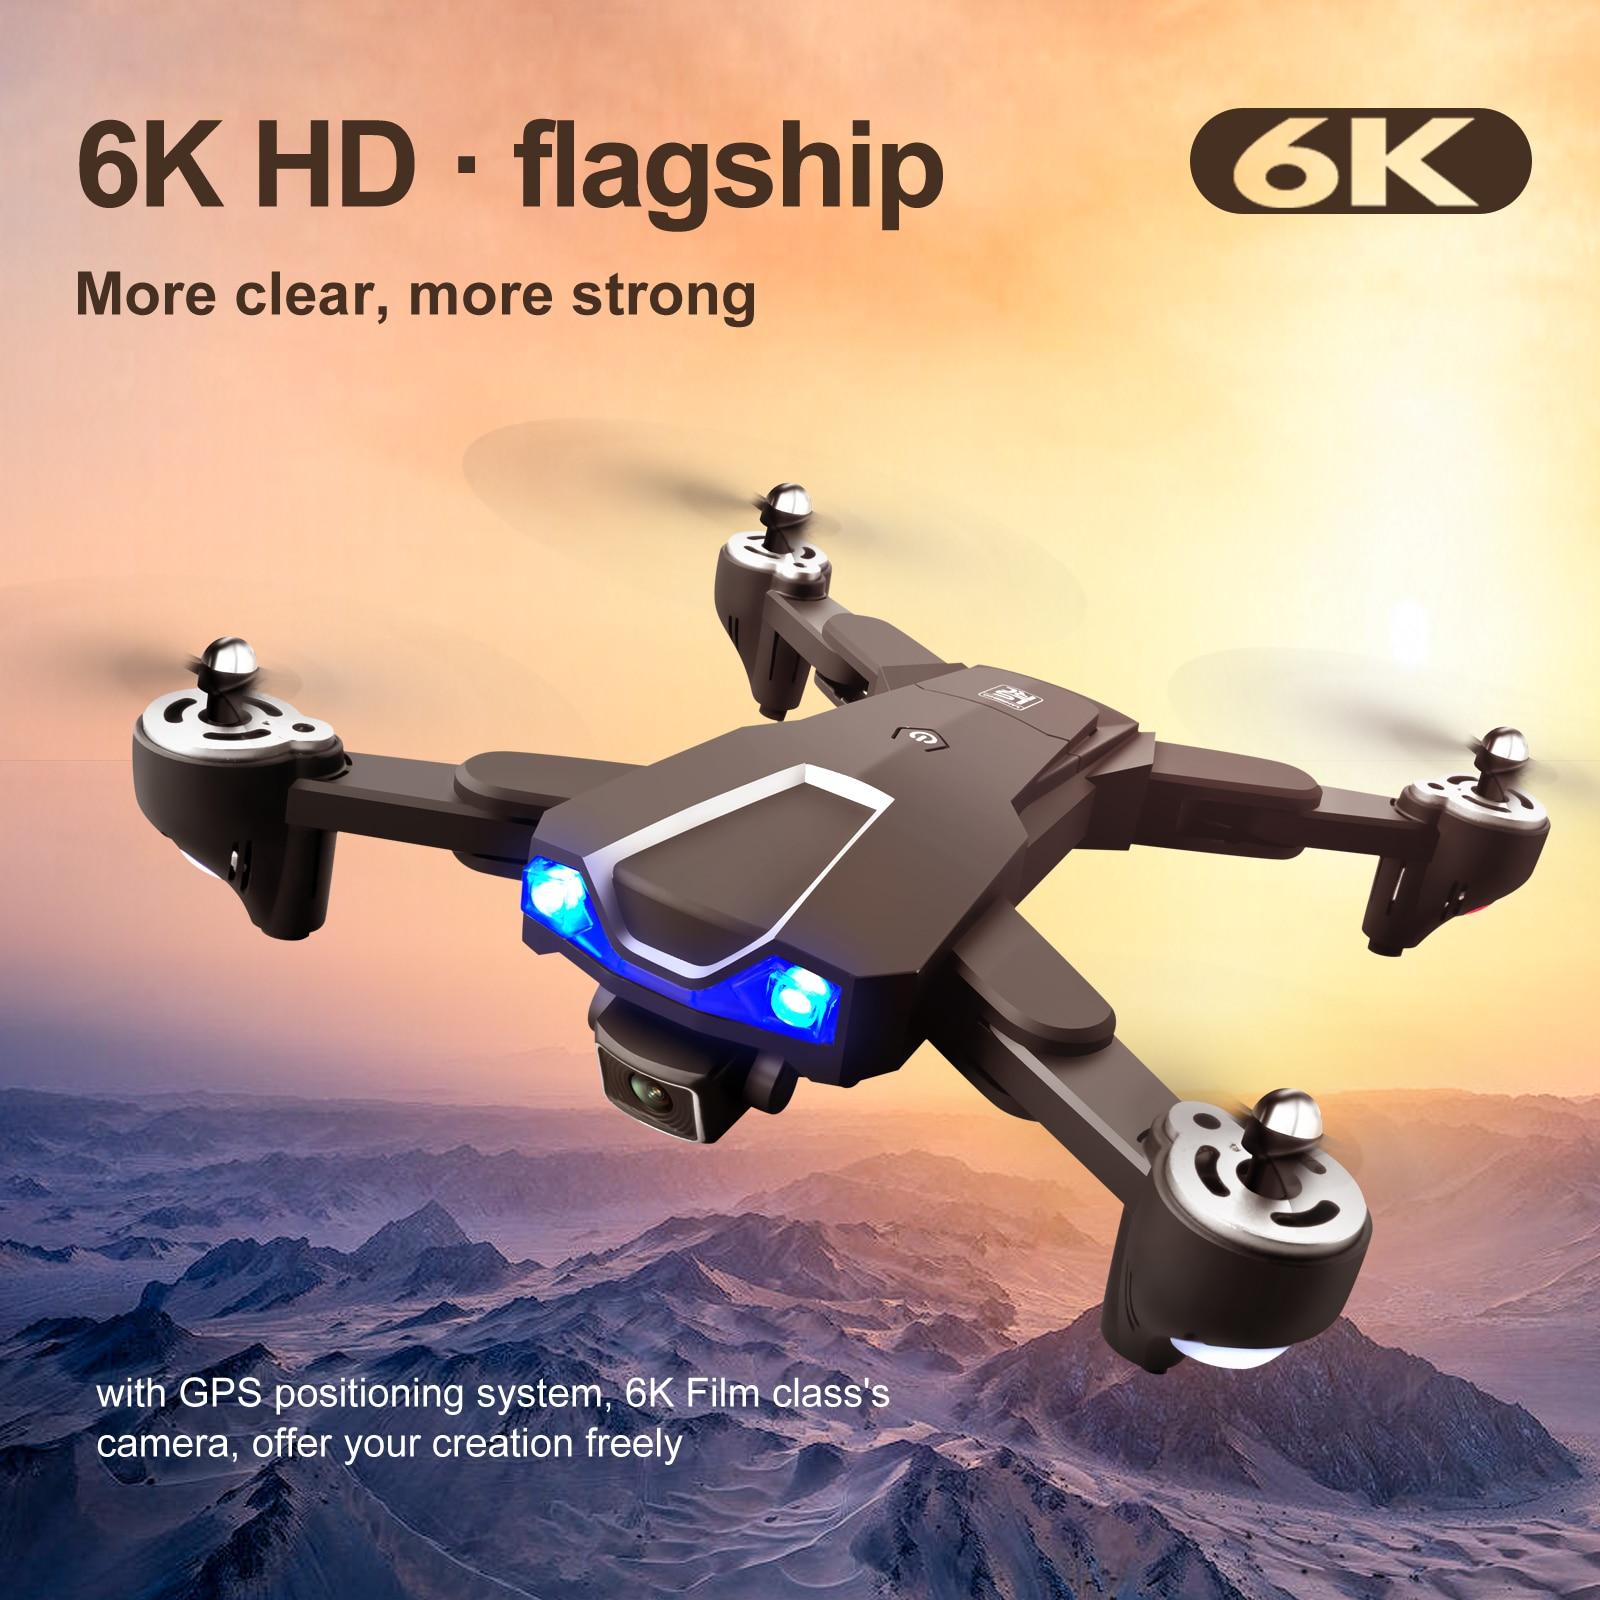 idg LS25 WIFI GPS Drone 8K HD ESC Camera Dual Camera Selfie Mode Follow Me Image Real-Time Transmission Foldable RC Quadcopter enlarge